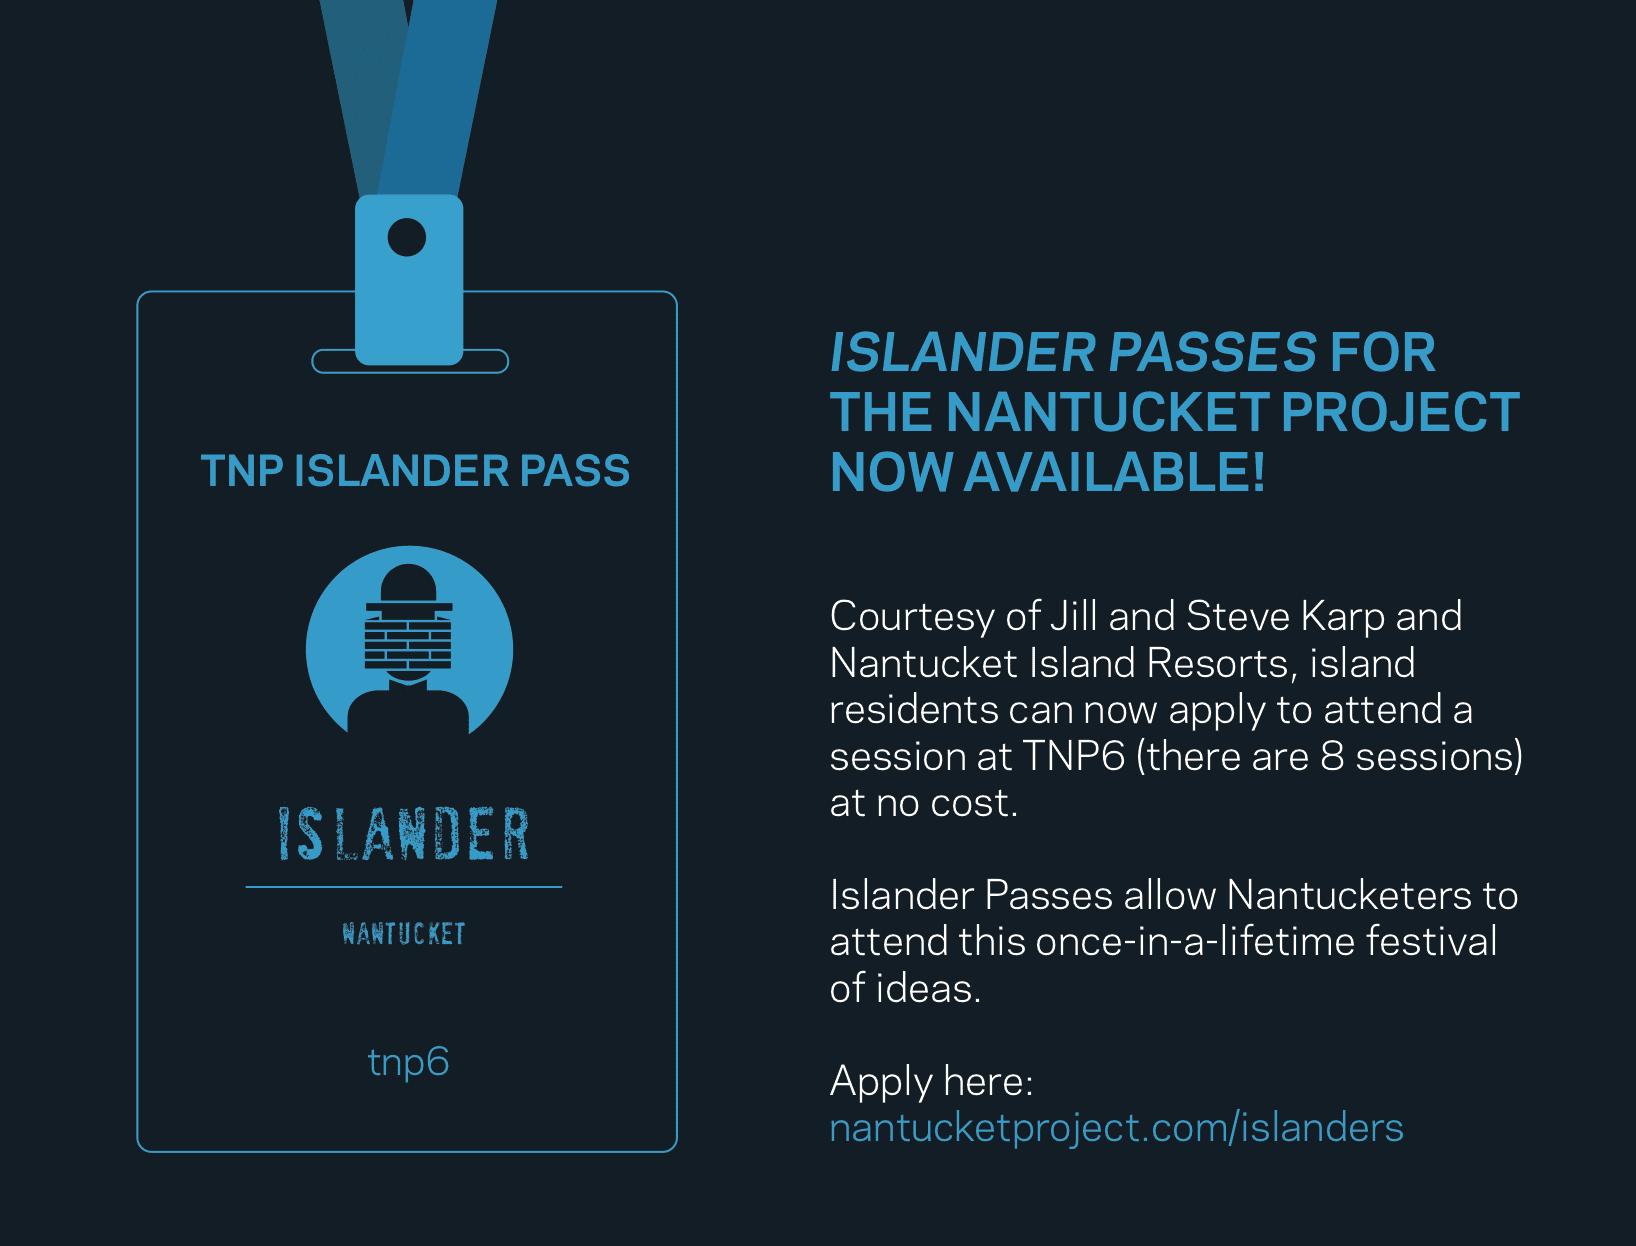 nantucket project islander pass